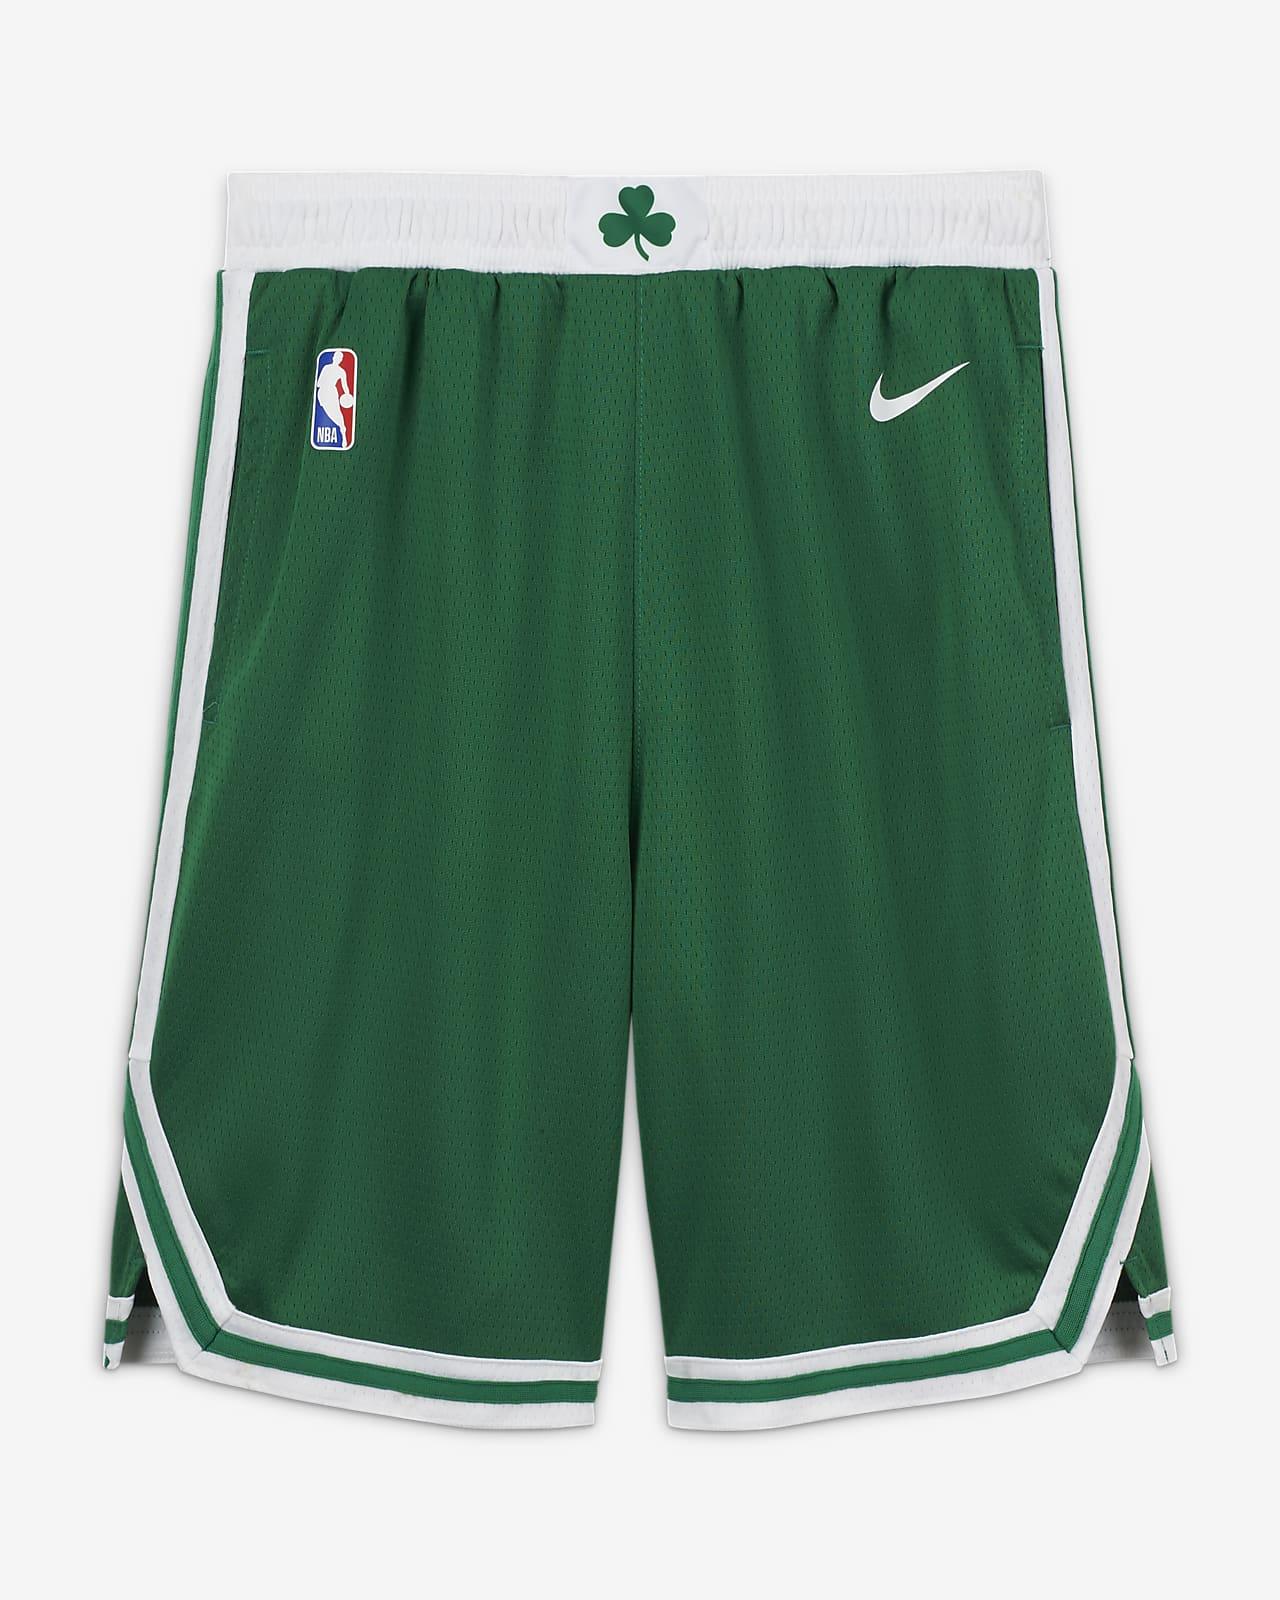 Boston Celtics Icon Edition Pantalons curts Nike NBA Swingman - Nen/a